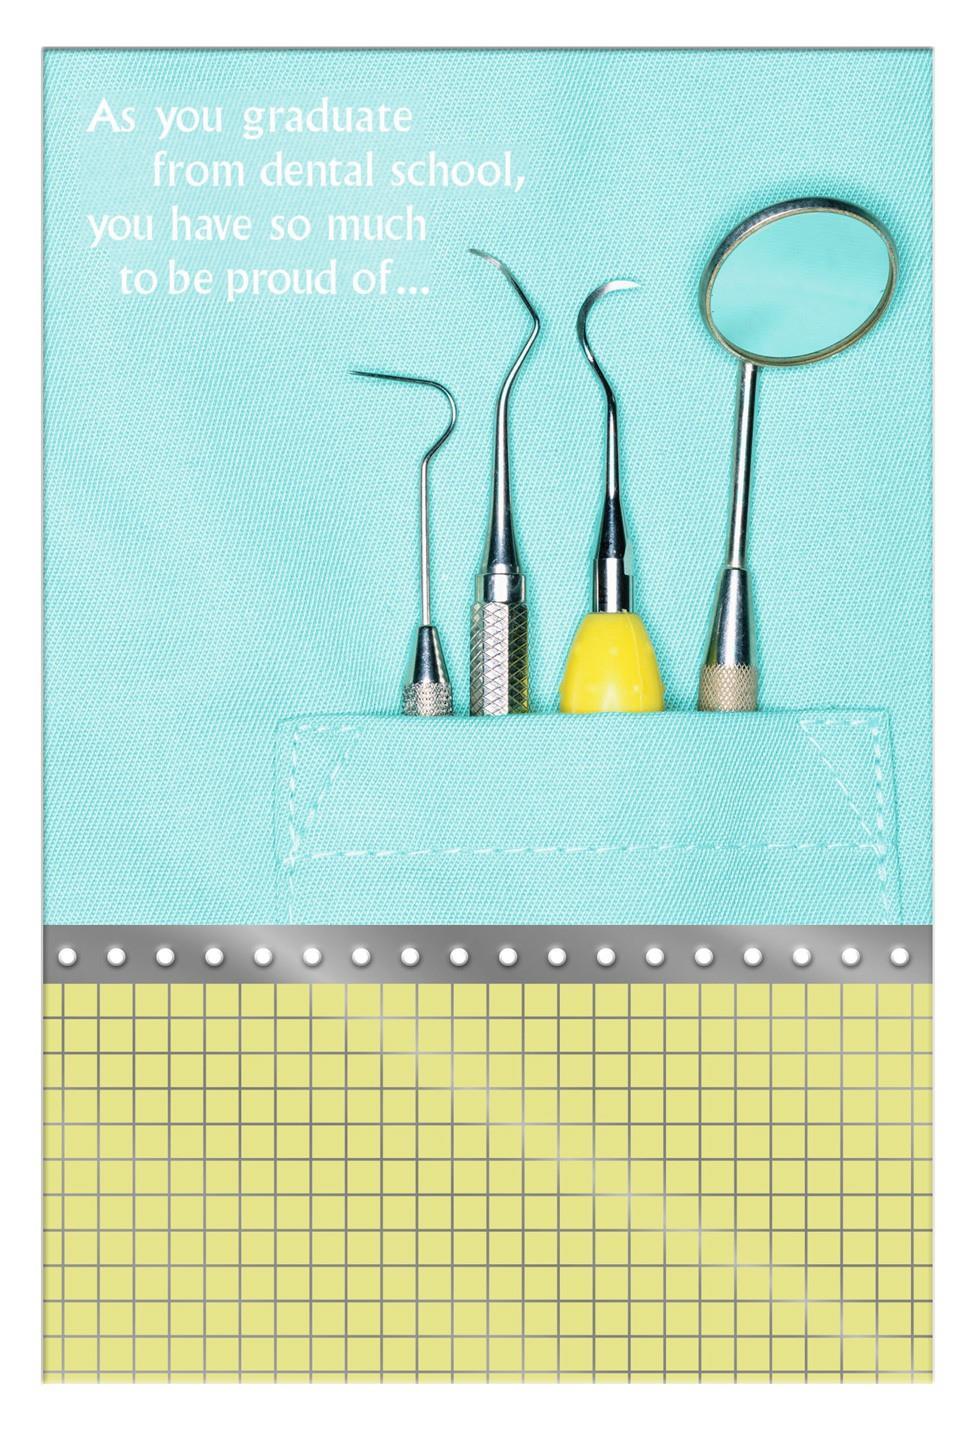 Dental School Graduation Card Greeting Cards Hallmark